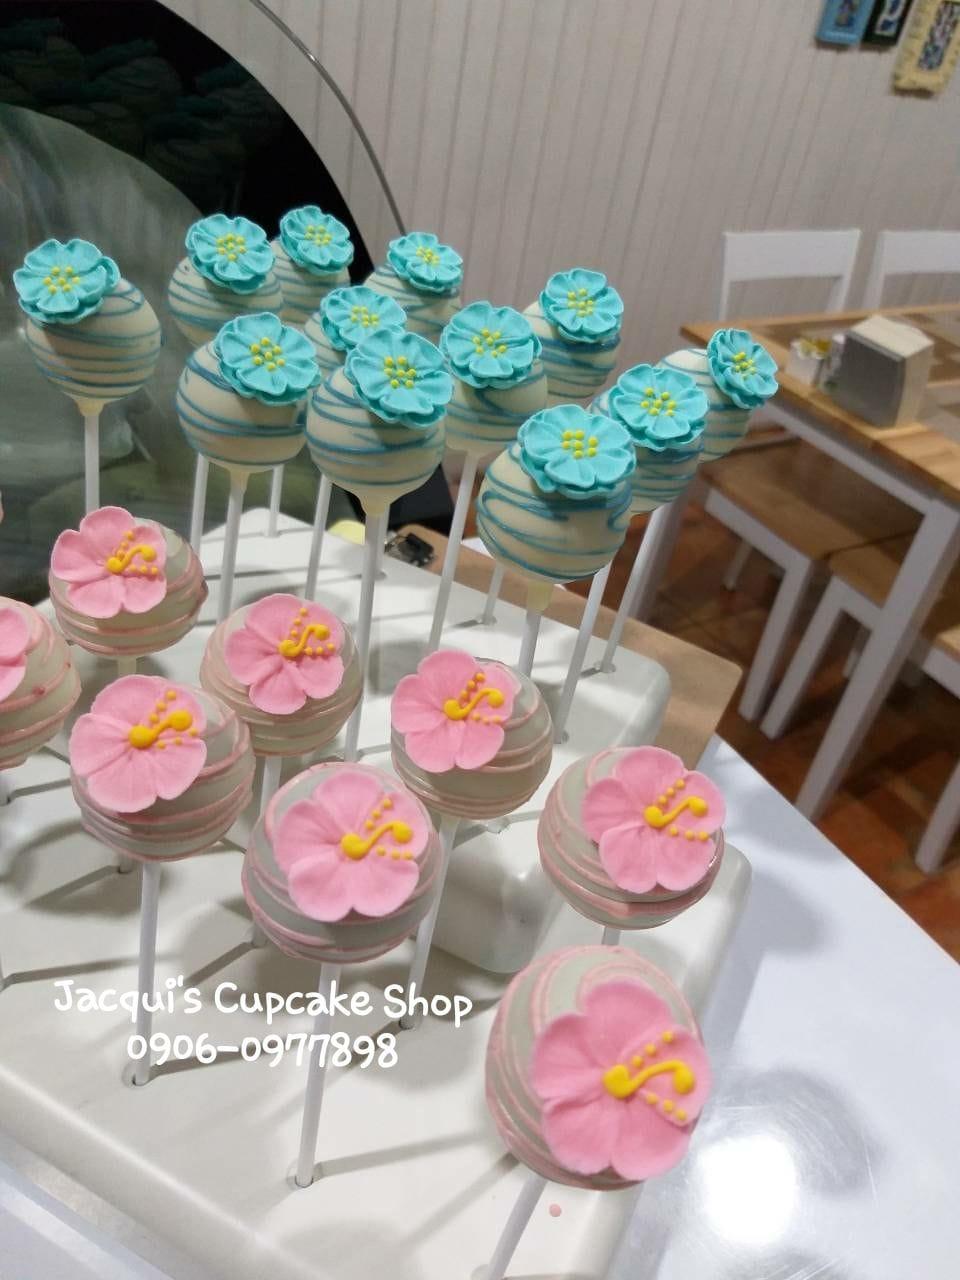 Jacqui's Customized cakepops for kids